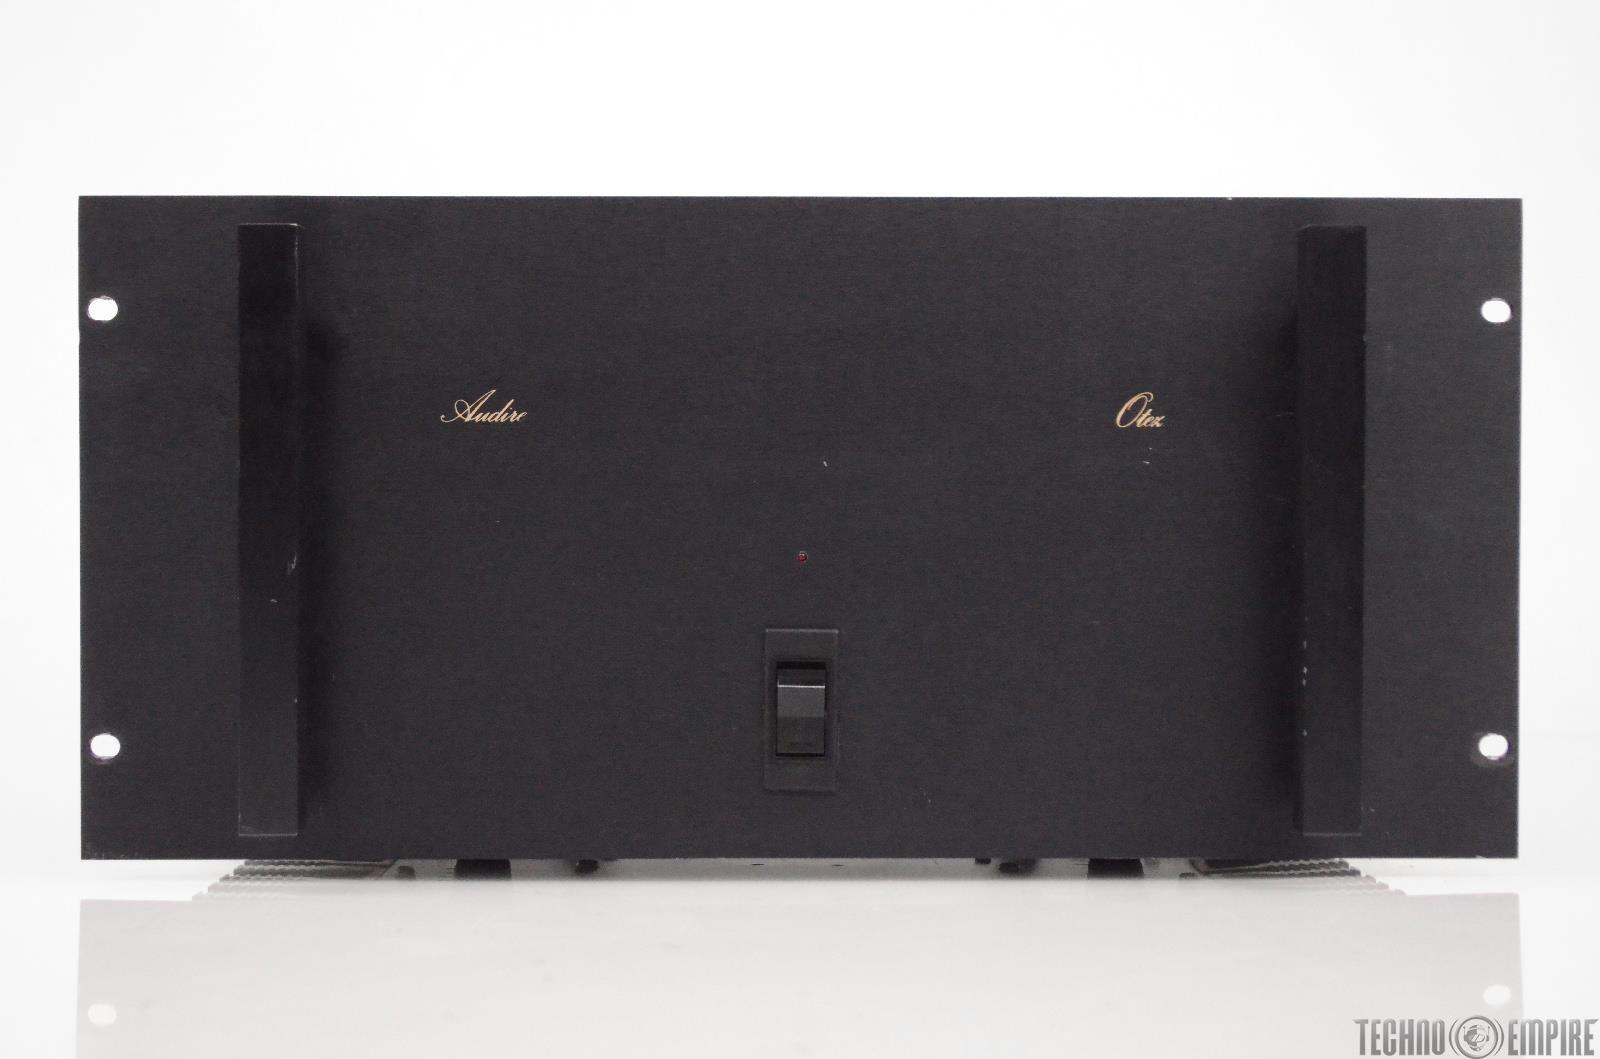 Audire Otez Stereo Power Amplifier 250 Watt 2 Channel Audiophile Amp #31157